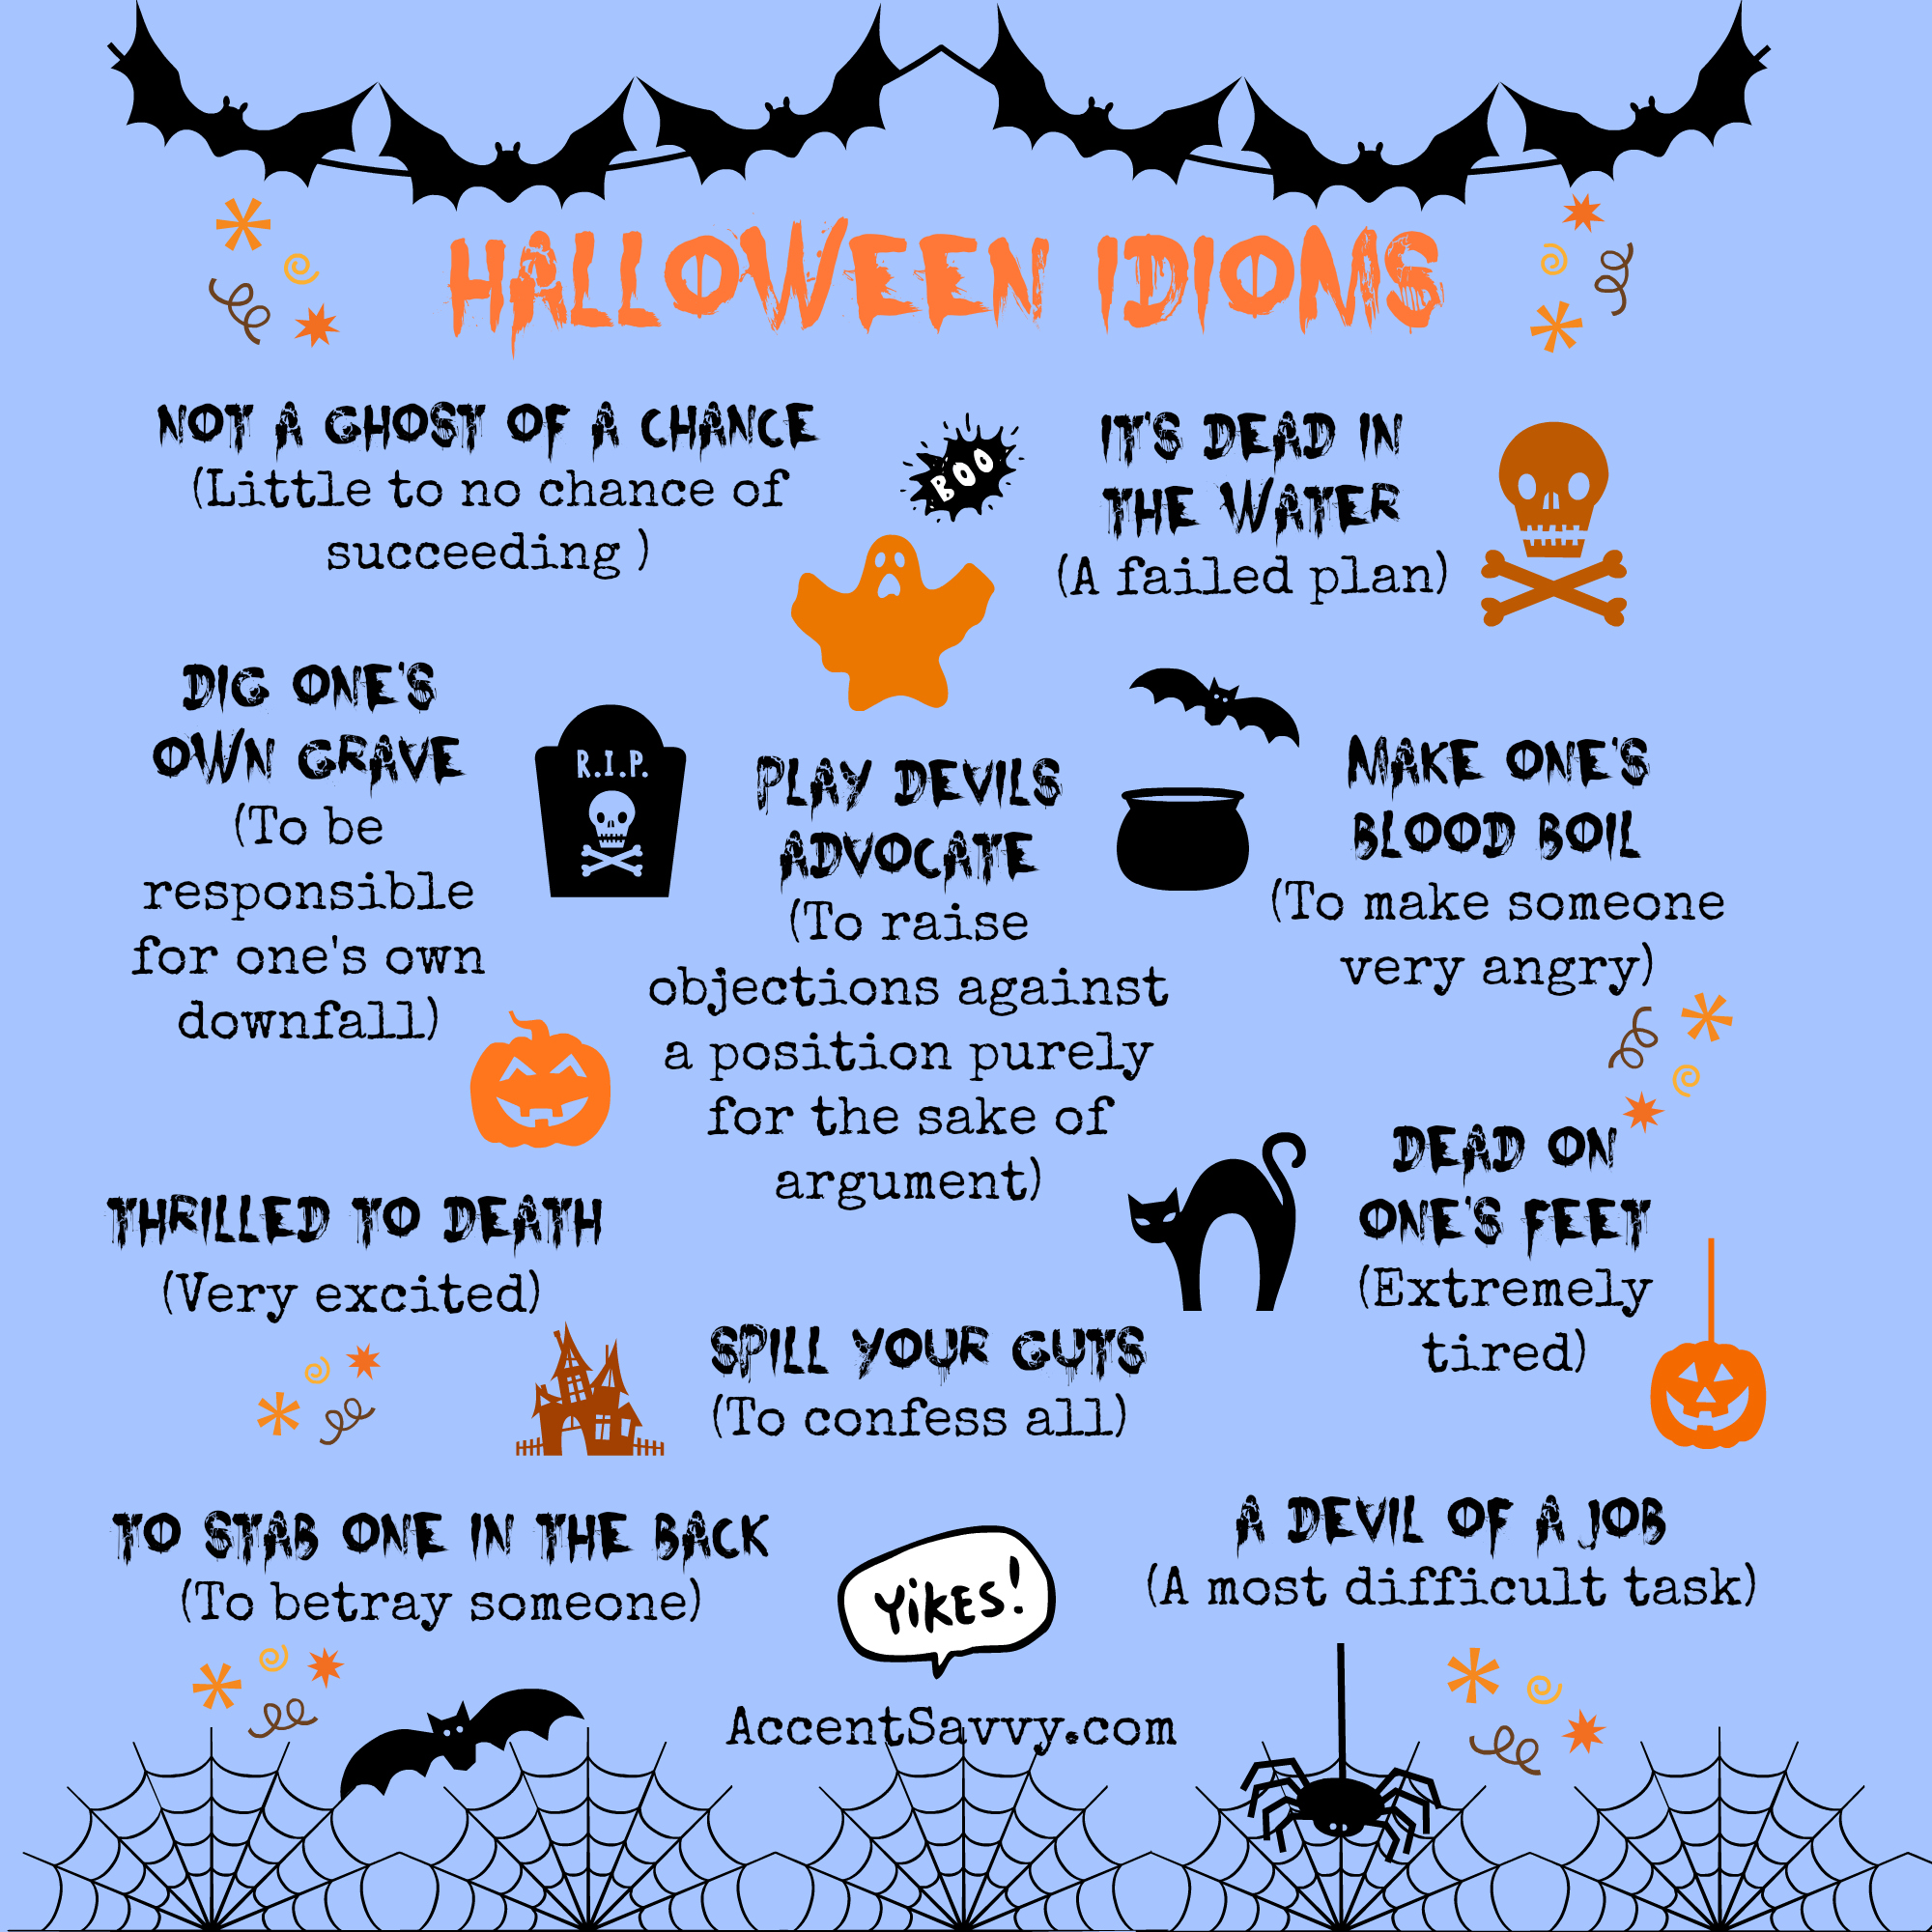 Halloween-accent-savvy.jpg